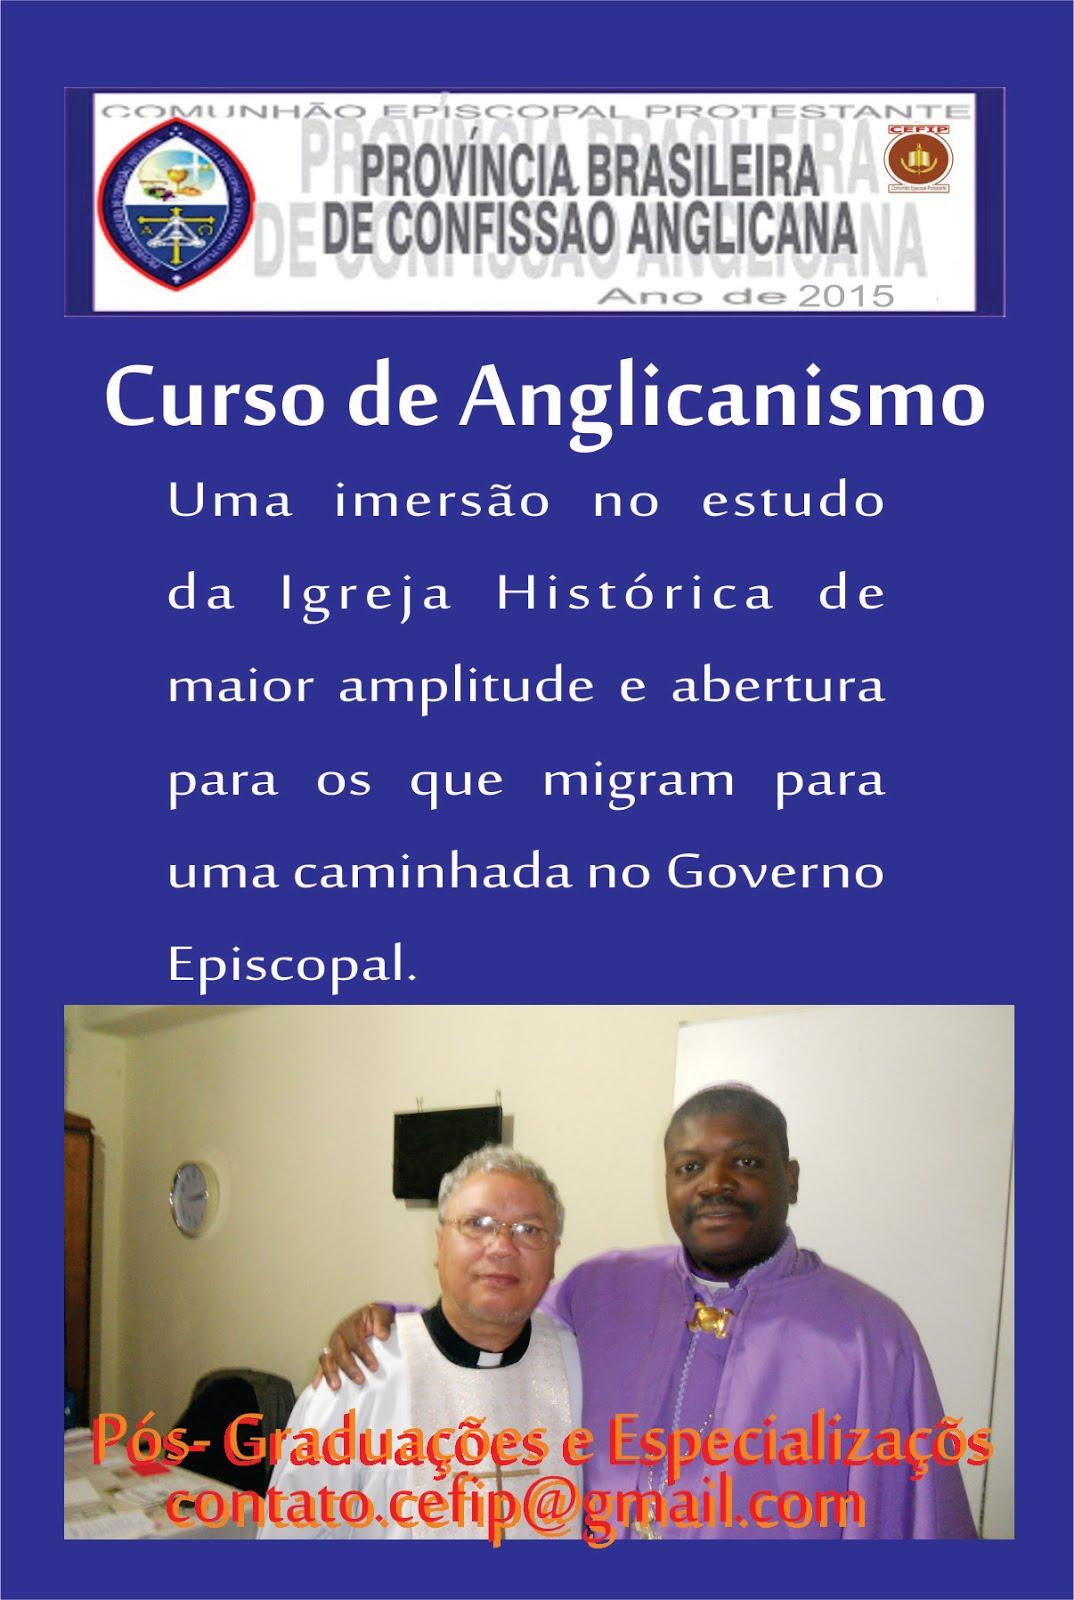 Cursos de Anglicanismo